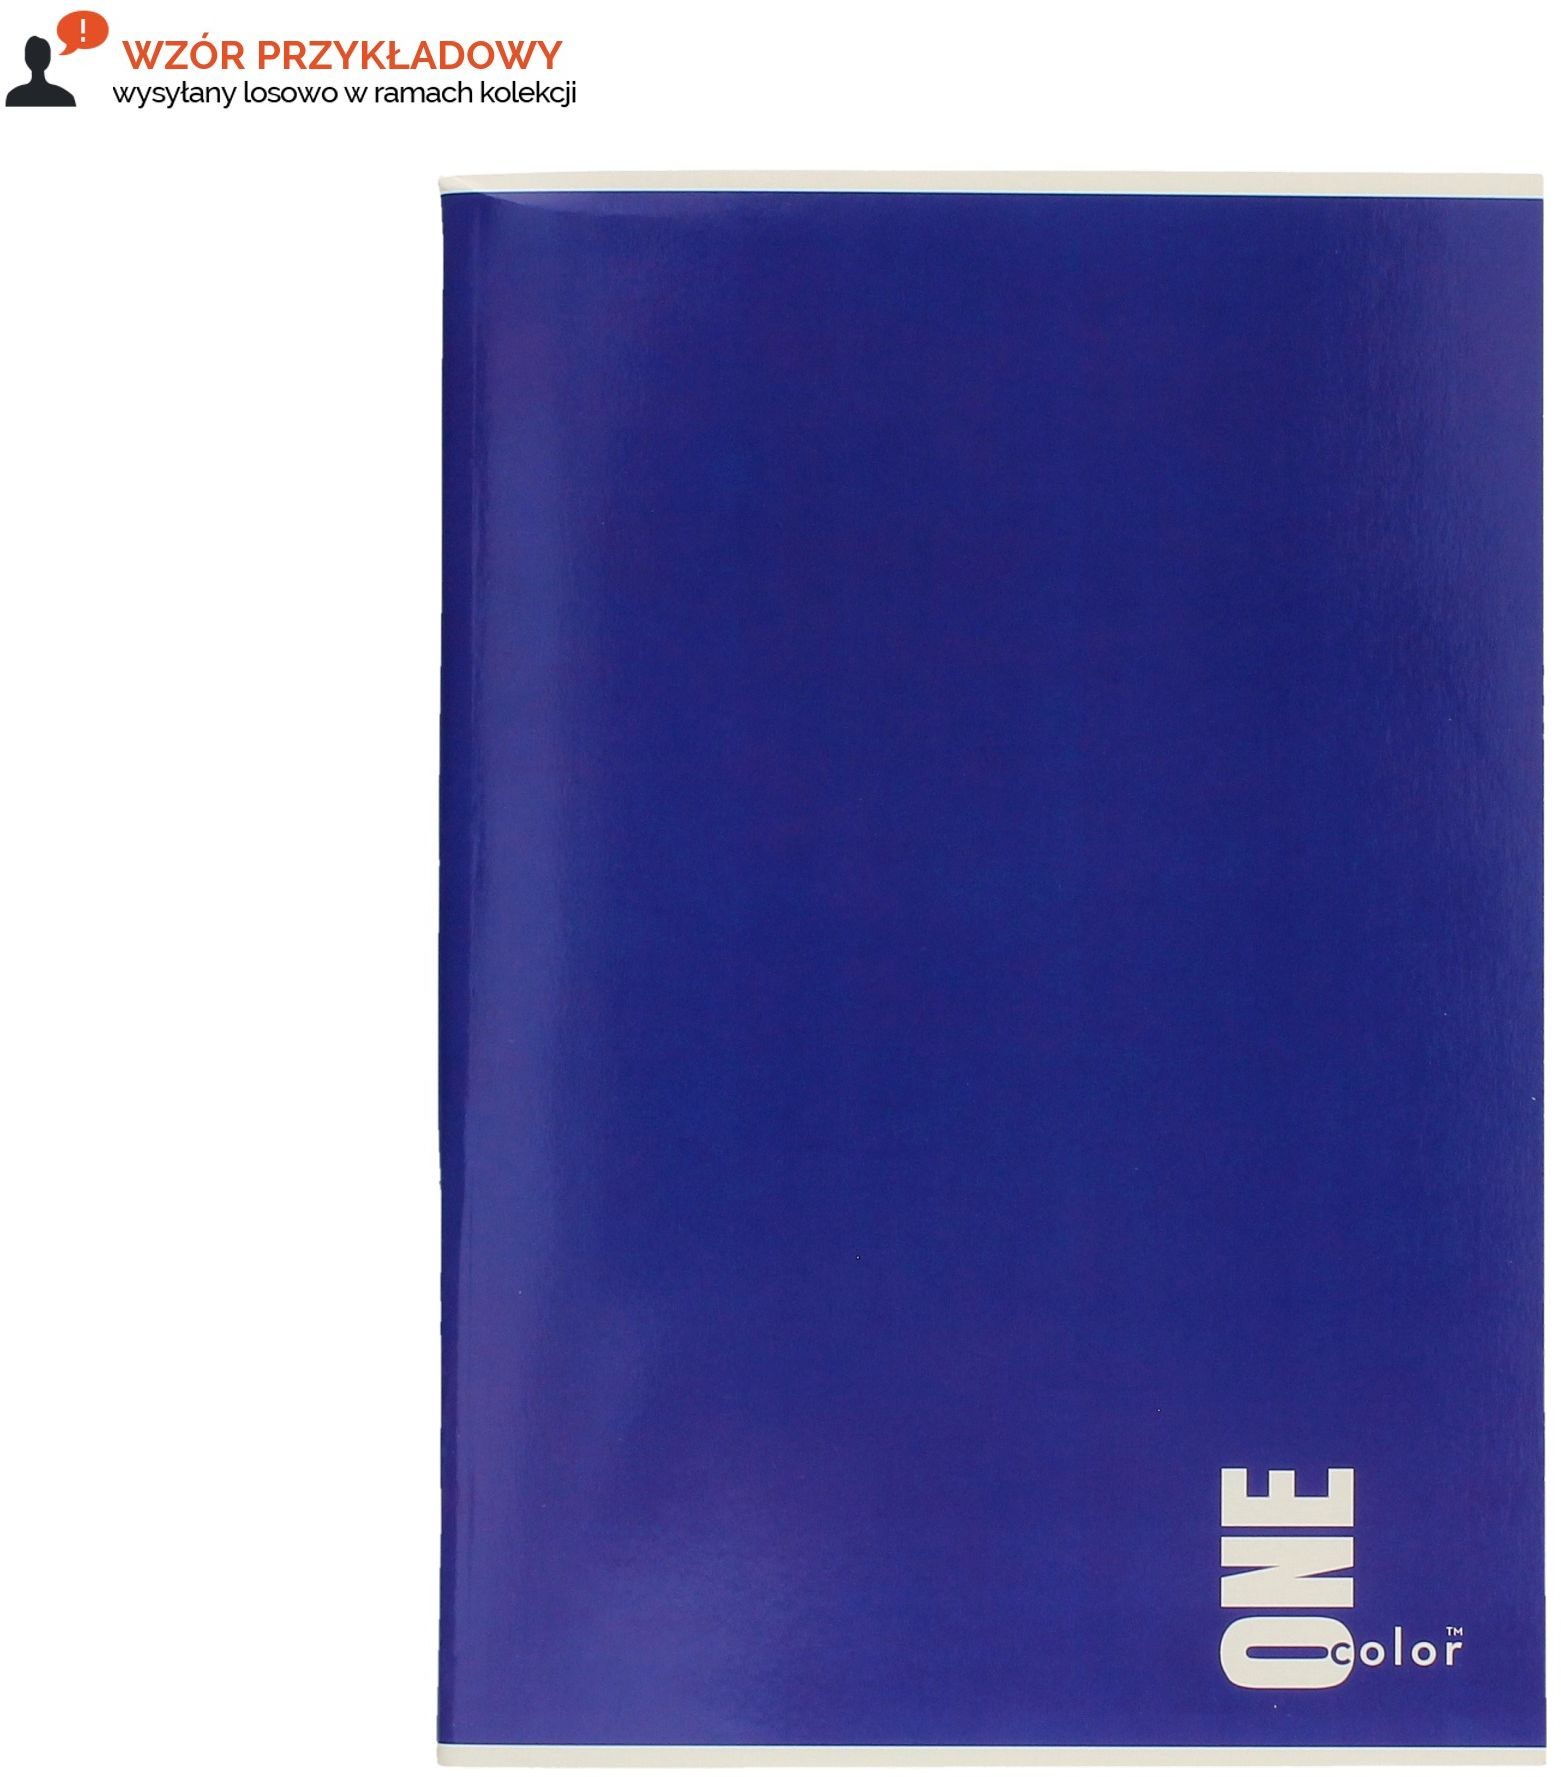 Zeszyt A4/96 kratka UV One Color Interdruk